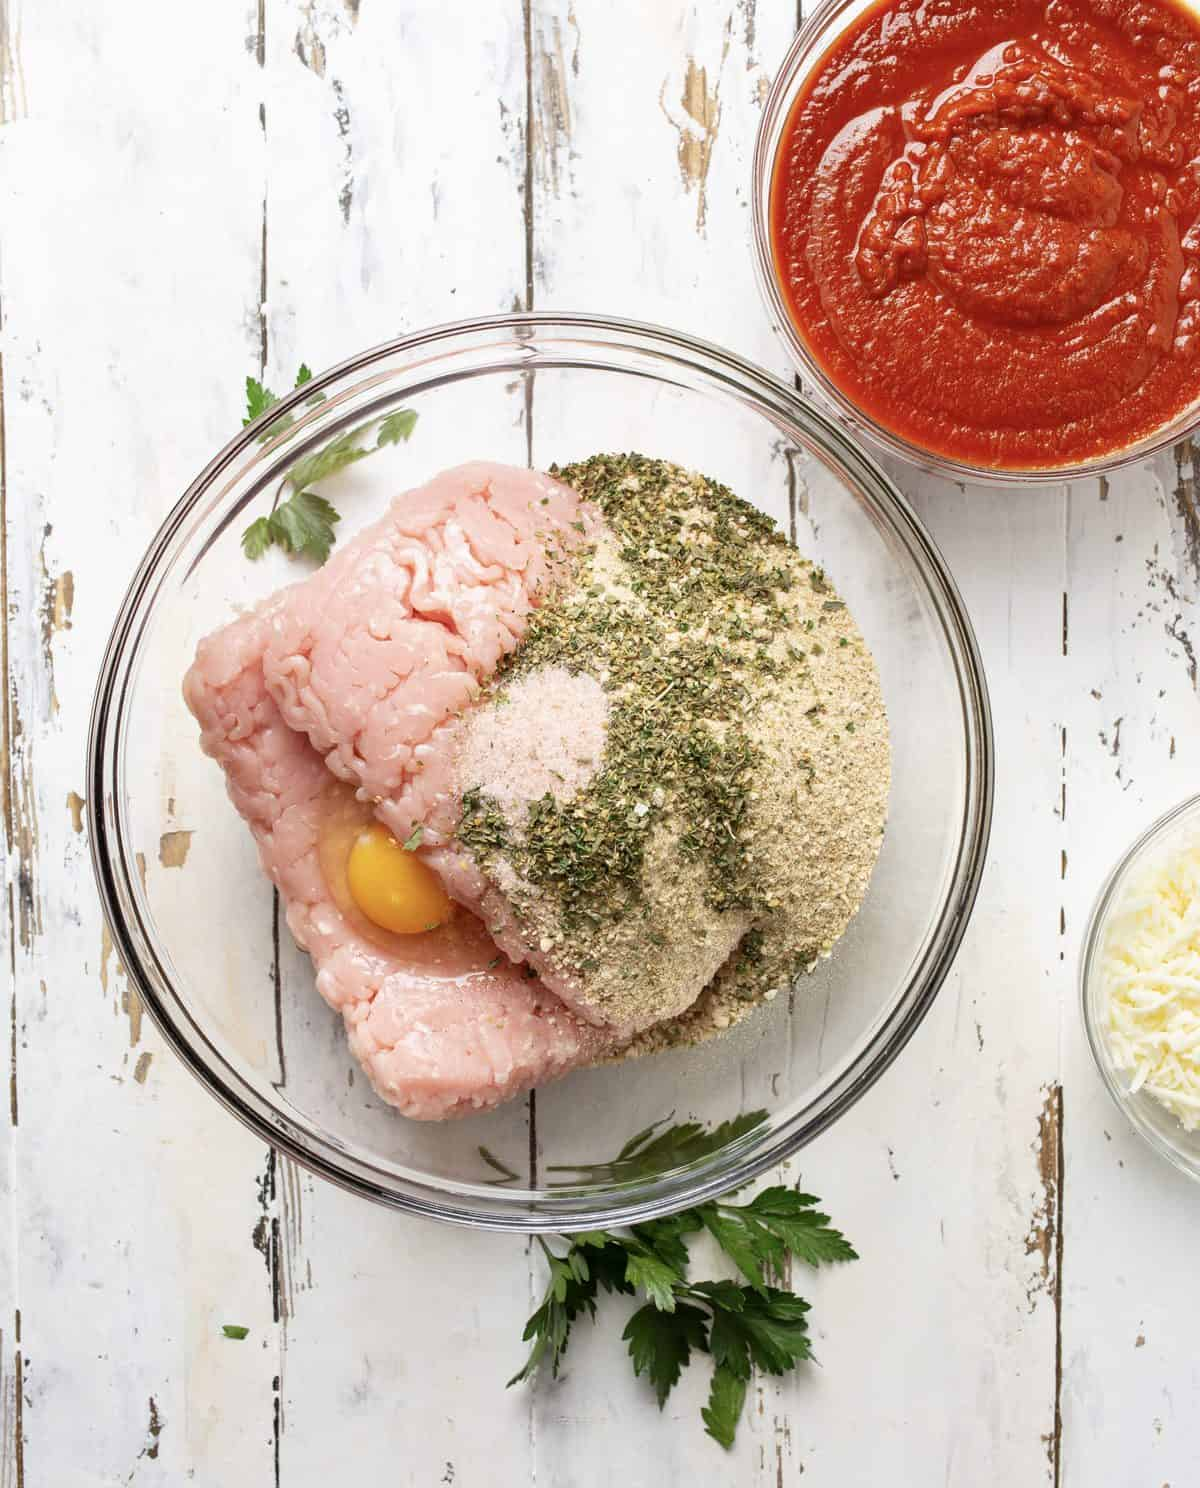 Ground turkey, italian breadcrumbs, eggs, italian seasoning and salt added to clear bowl.